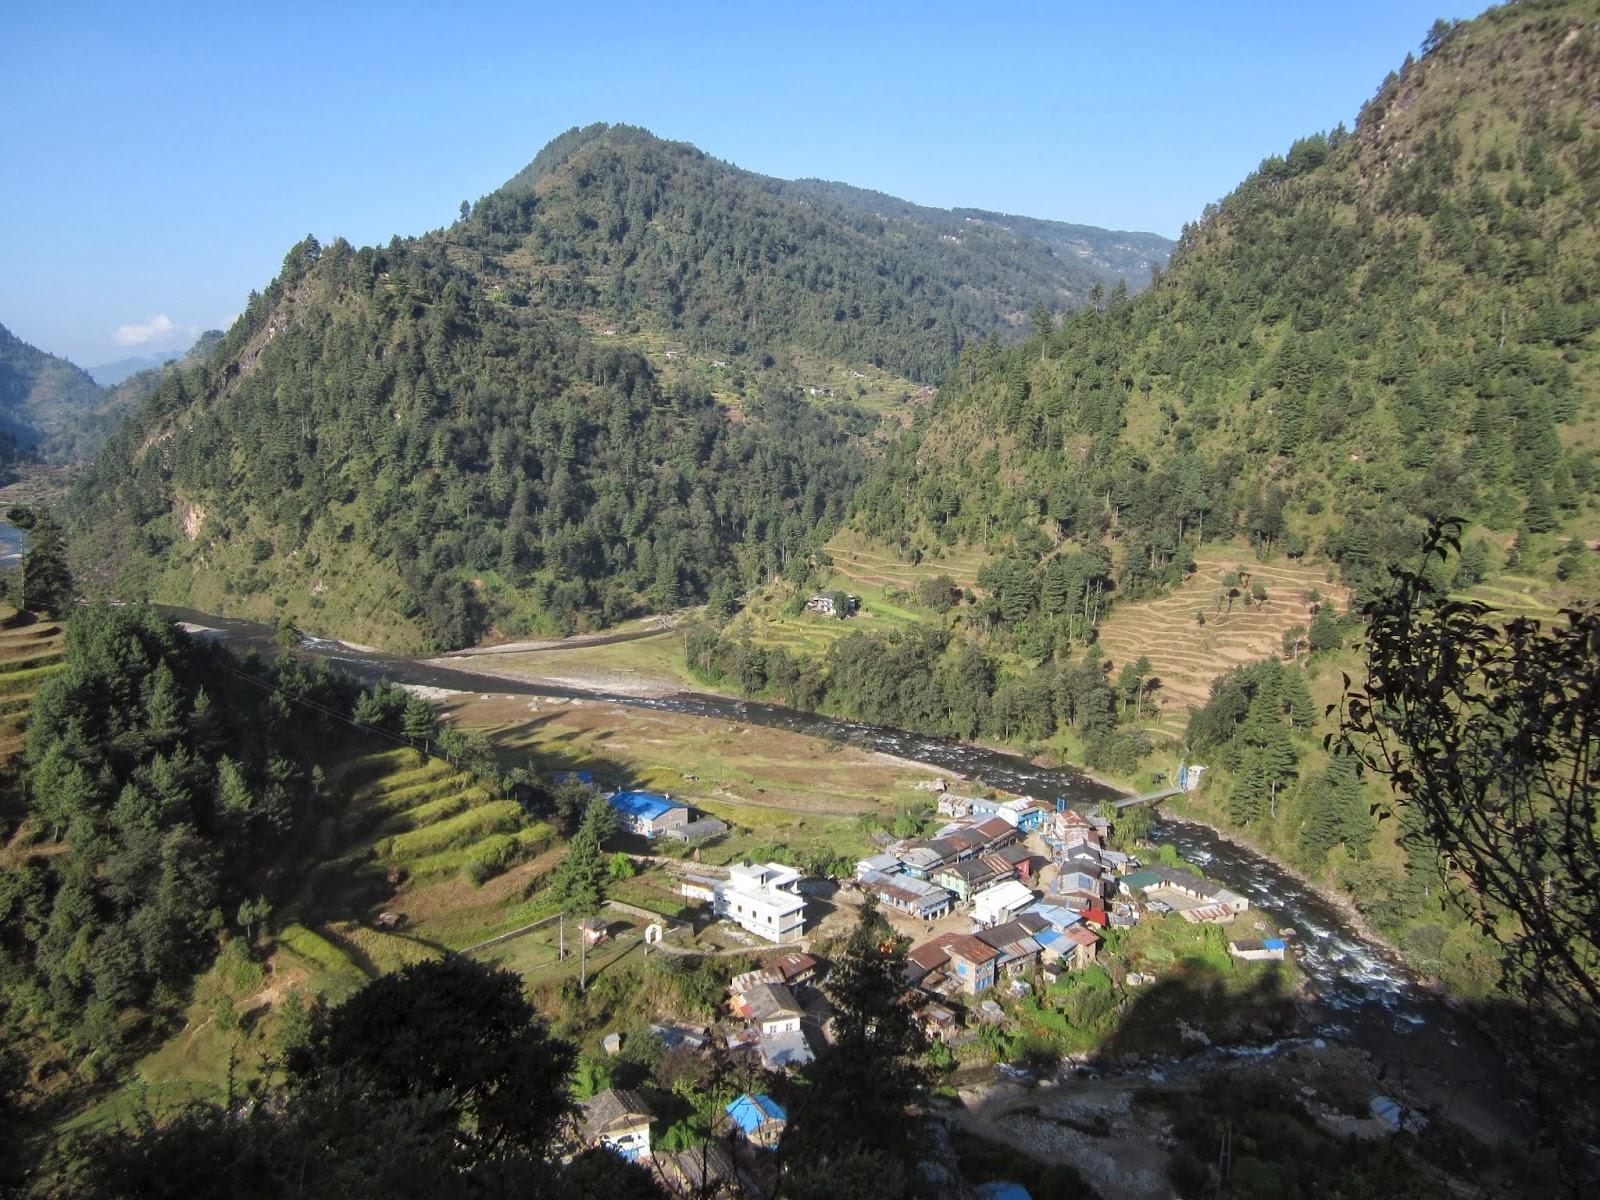 essay about our country nepal بهترینهای بازی و برنامه موبایل در سال 2016 برای اندروید و آی او اس + دانلود دی ۳, ۱۳۹۵.